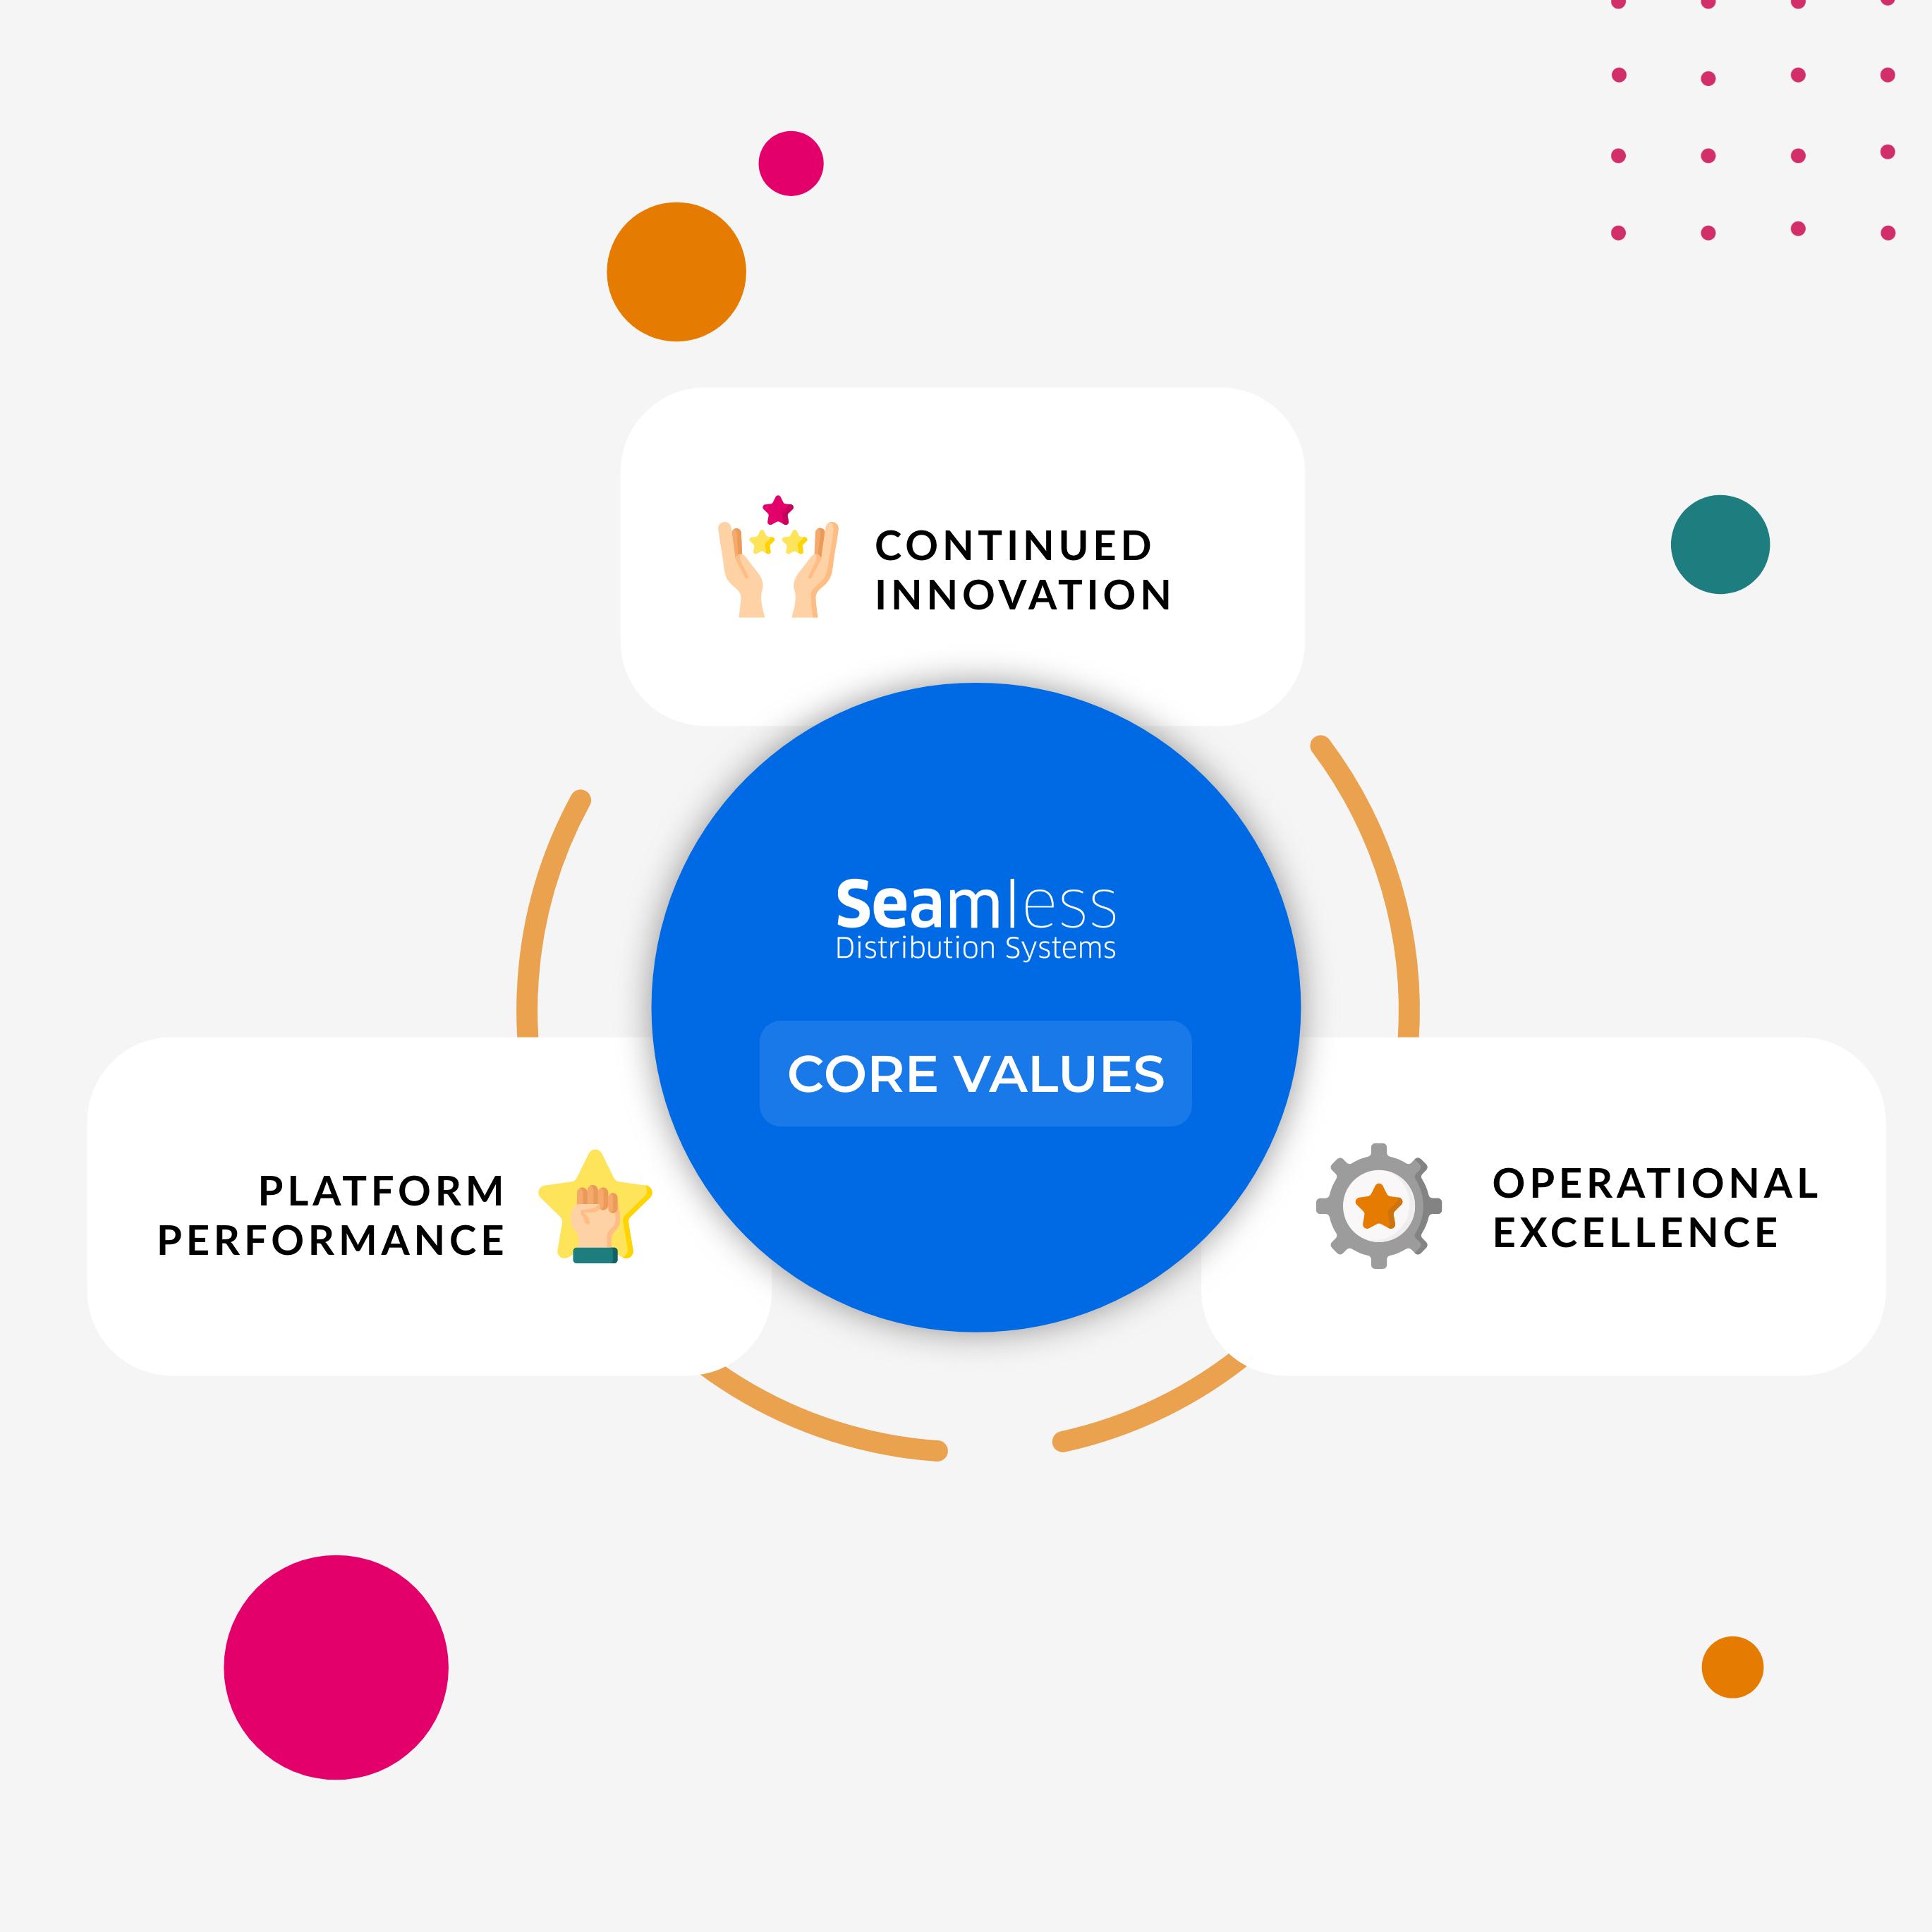 Seamless digital transformation